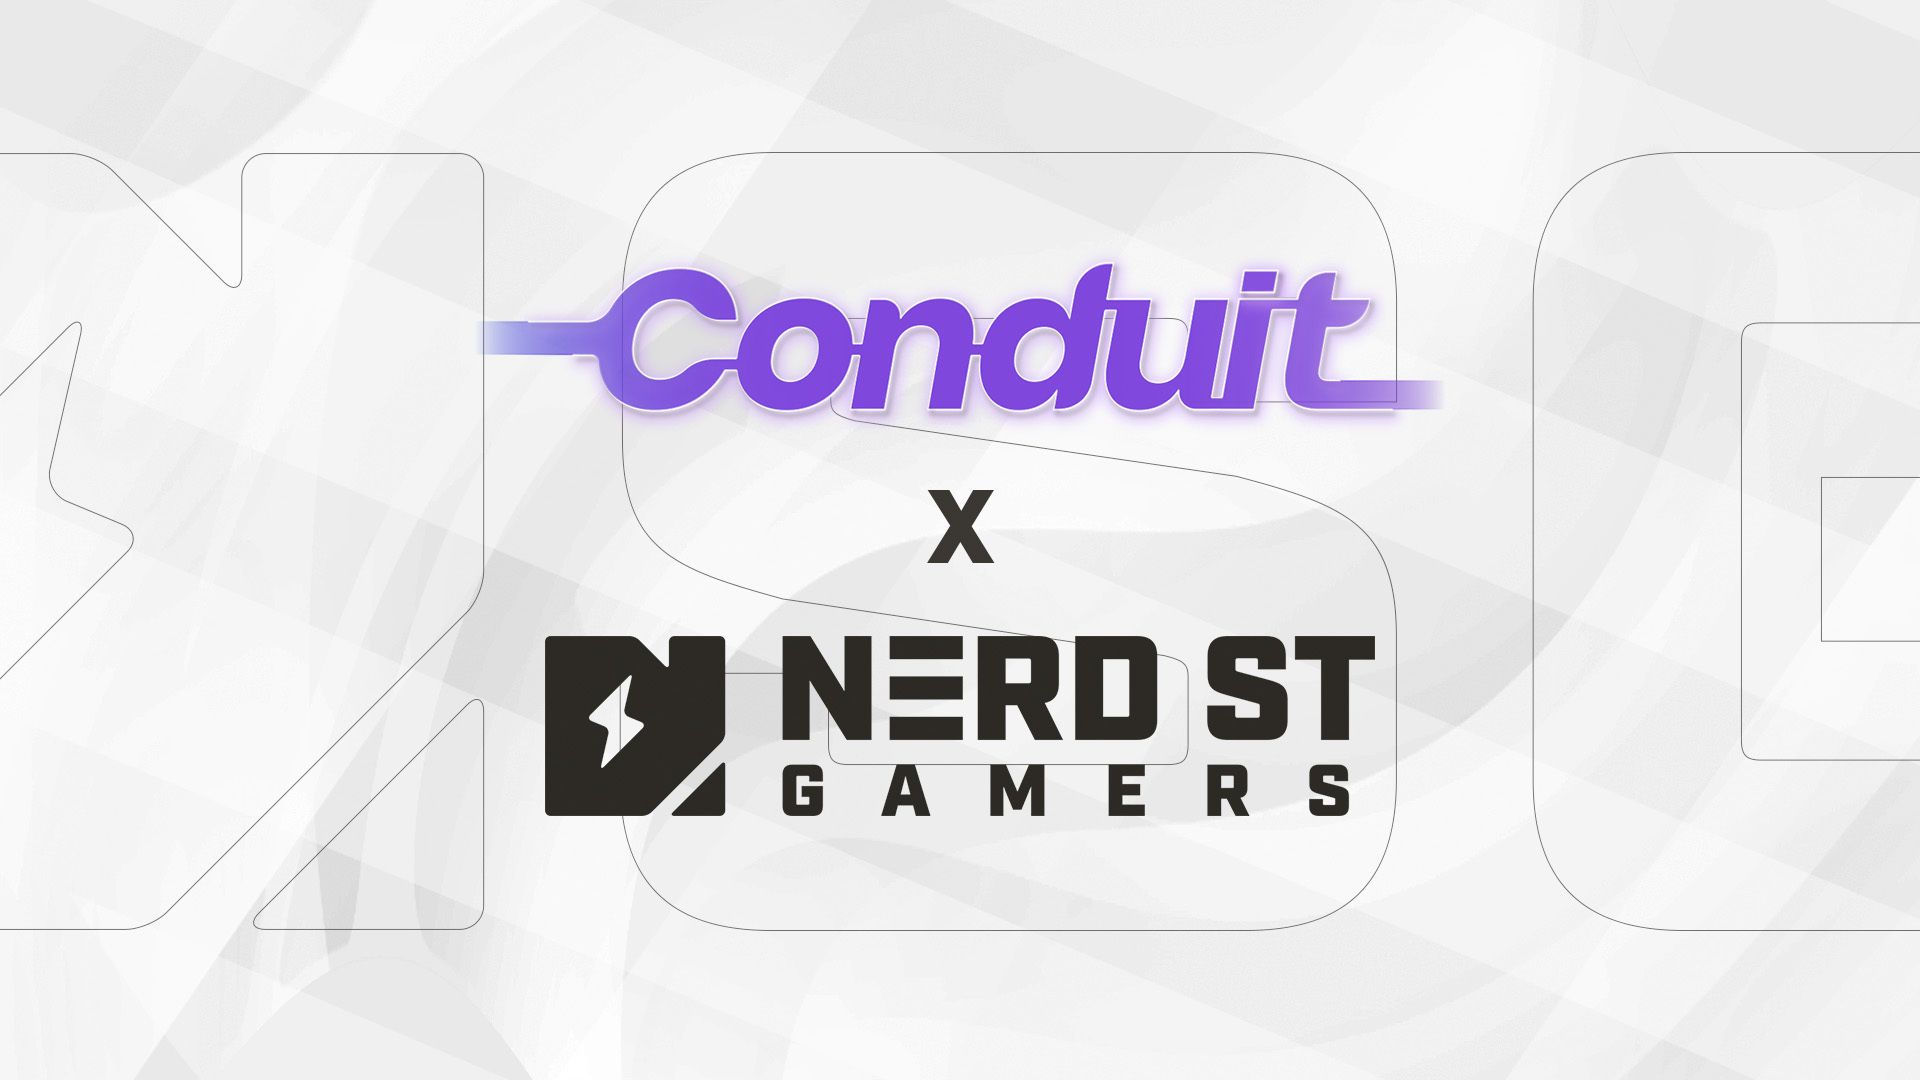 Conduit logo and Nerd Street Gamers logo